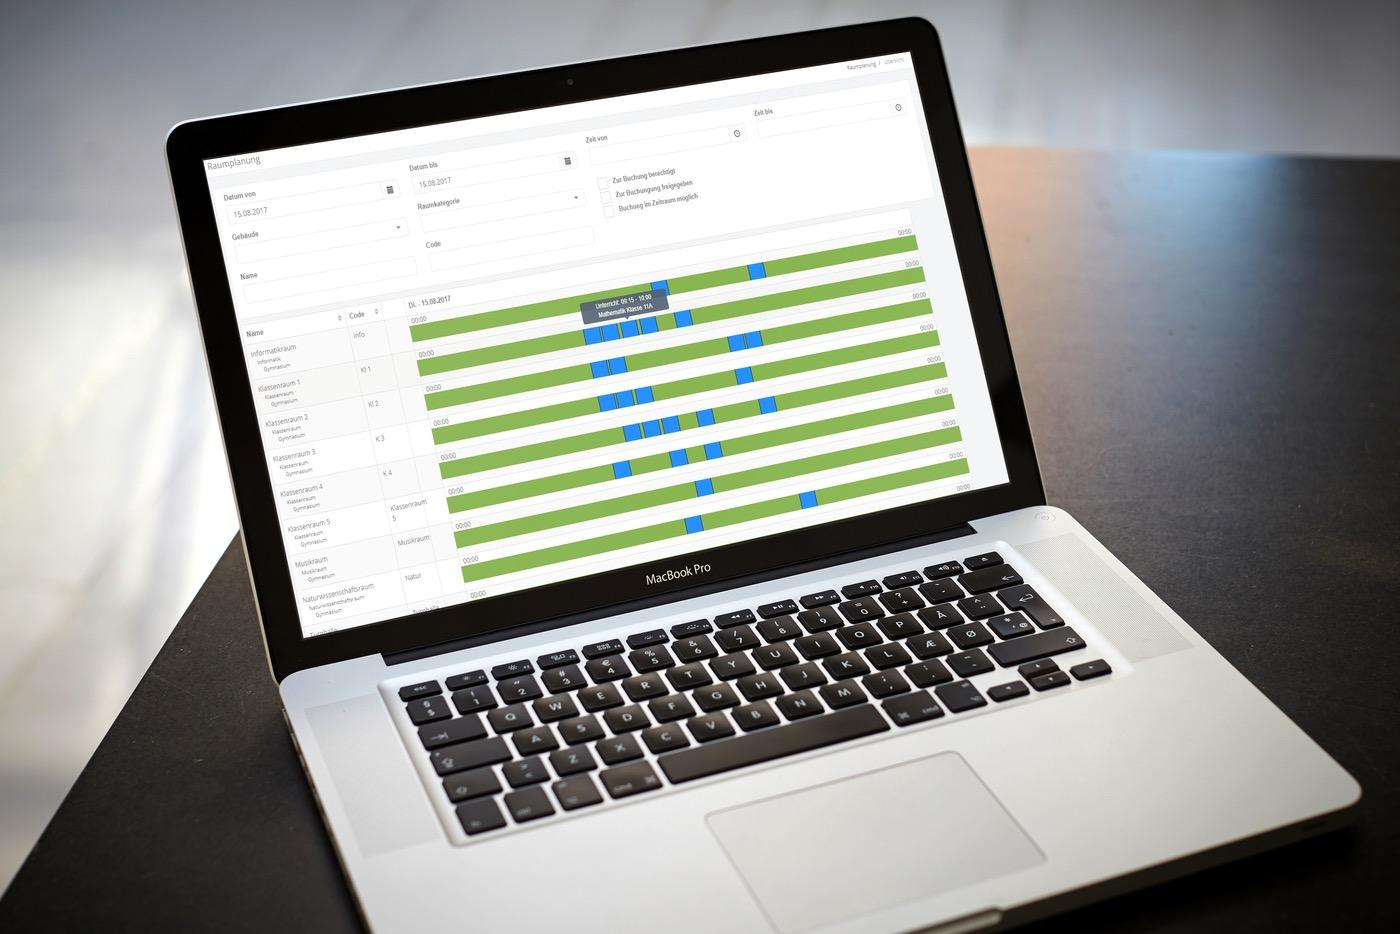 Stundenplanprogramm for Raum planung software